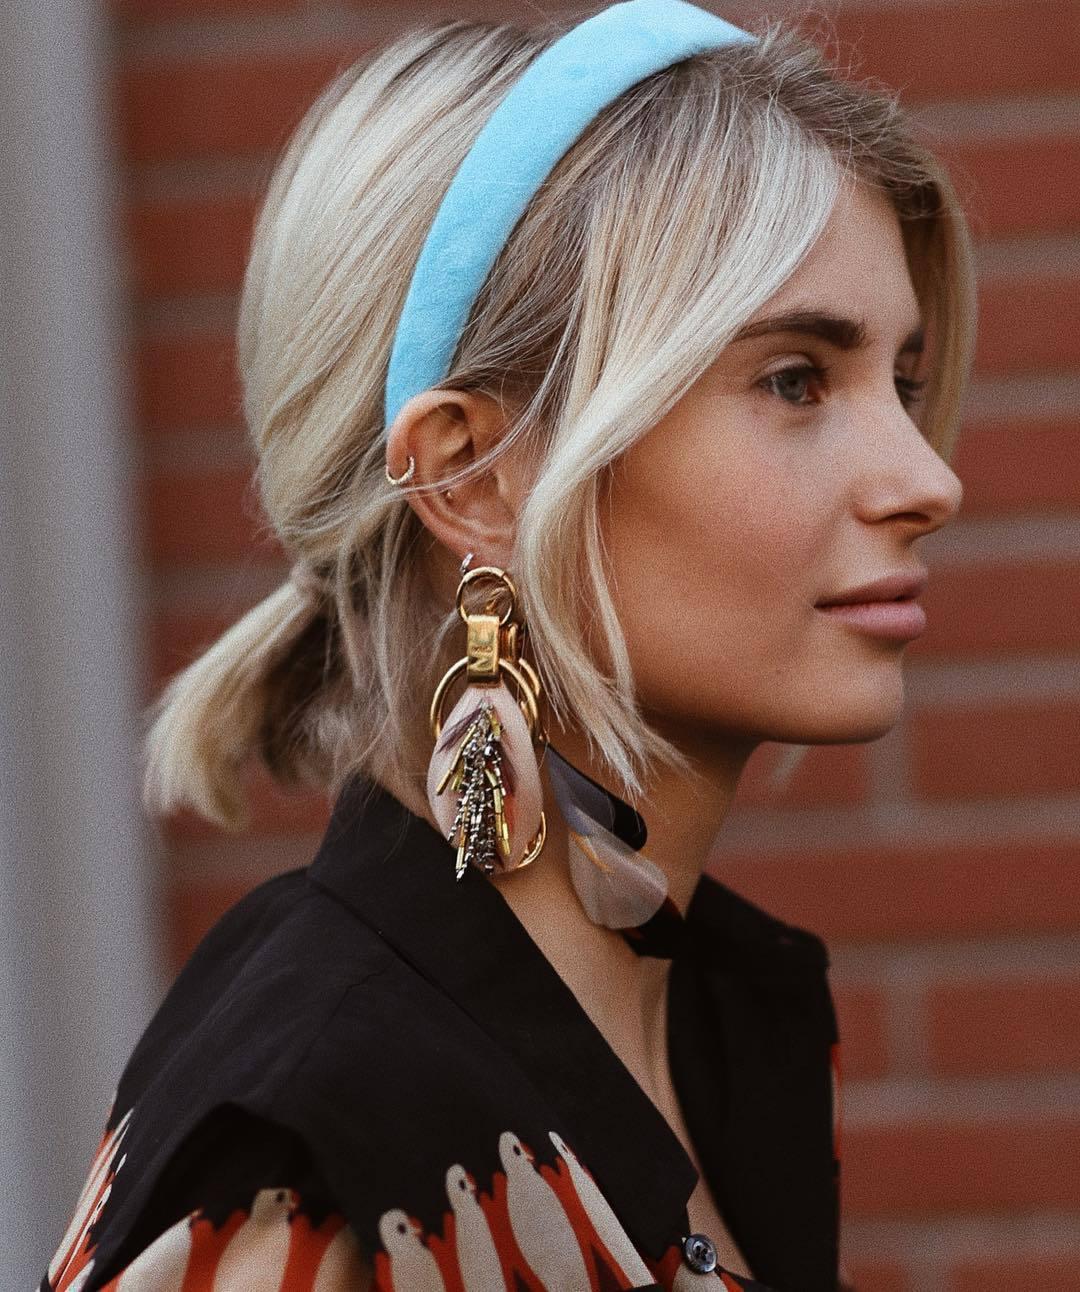 hair accessory headband aqua gold earrings feathers black shirt